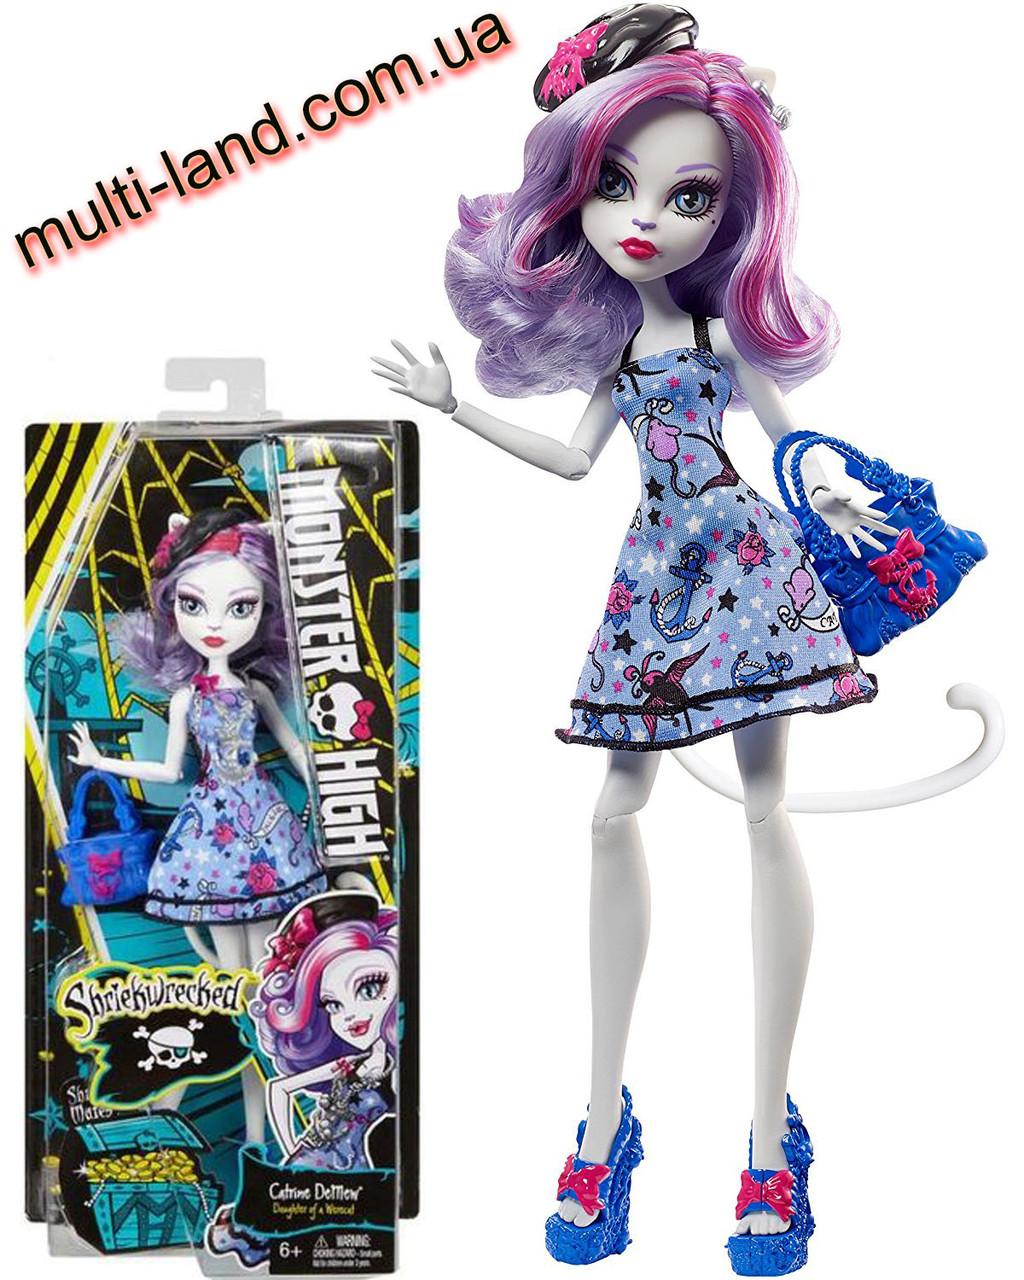 Кэтрин Демяу из серии Кораблекрушение Кукла Монстер Хай Monster High Shriekwrecked Shriek Mates Catrine Demew